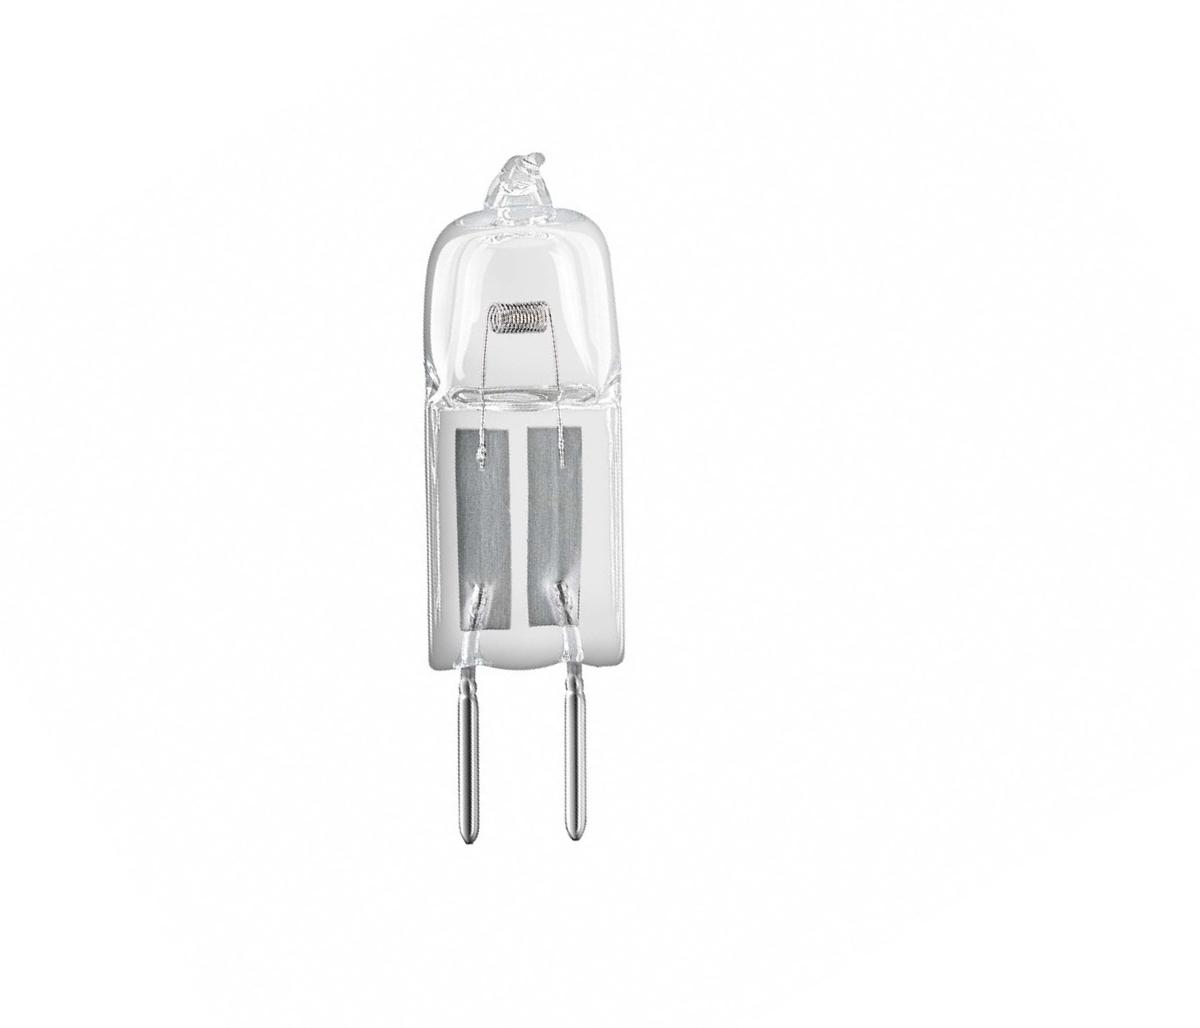 1 Stk QT 12 50W 12V GY6,35 Niedervolt Halogenlampe LI5U64440-